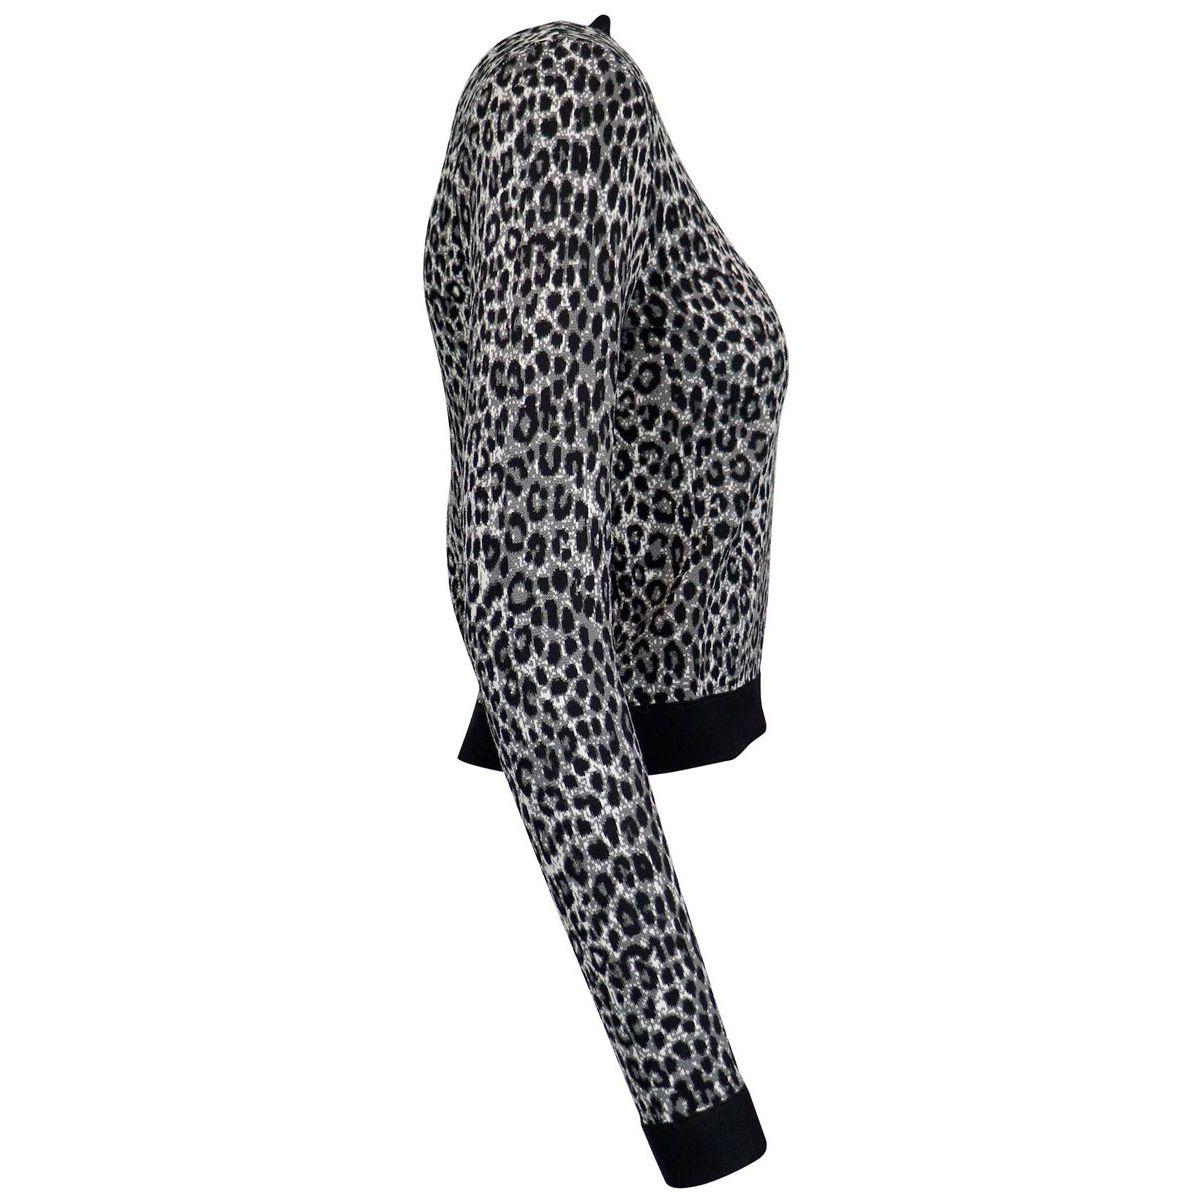 Turtleneck sweater in viscose blend with animal print Grey Michael Kors